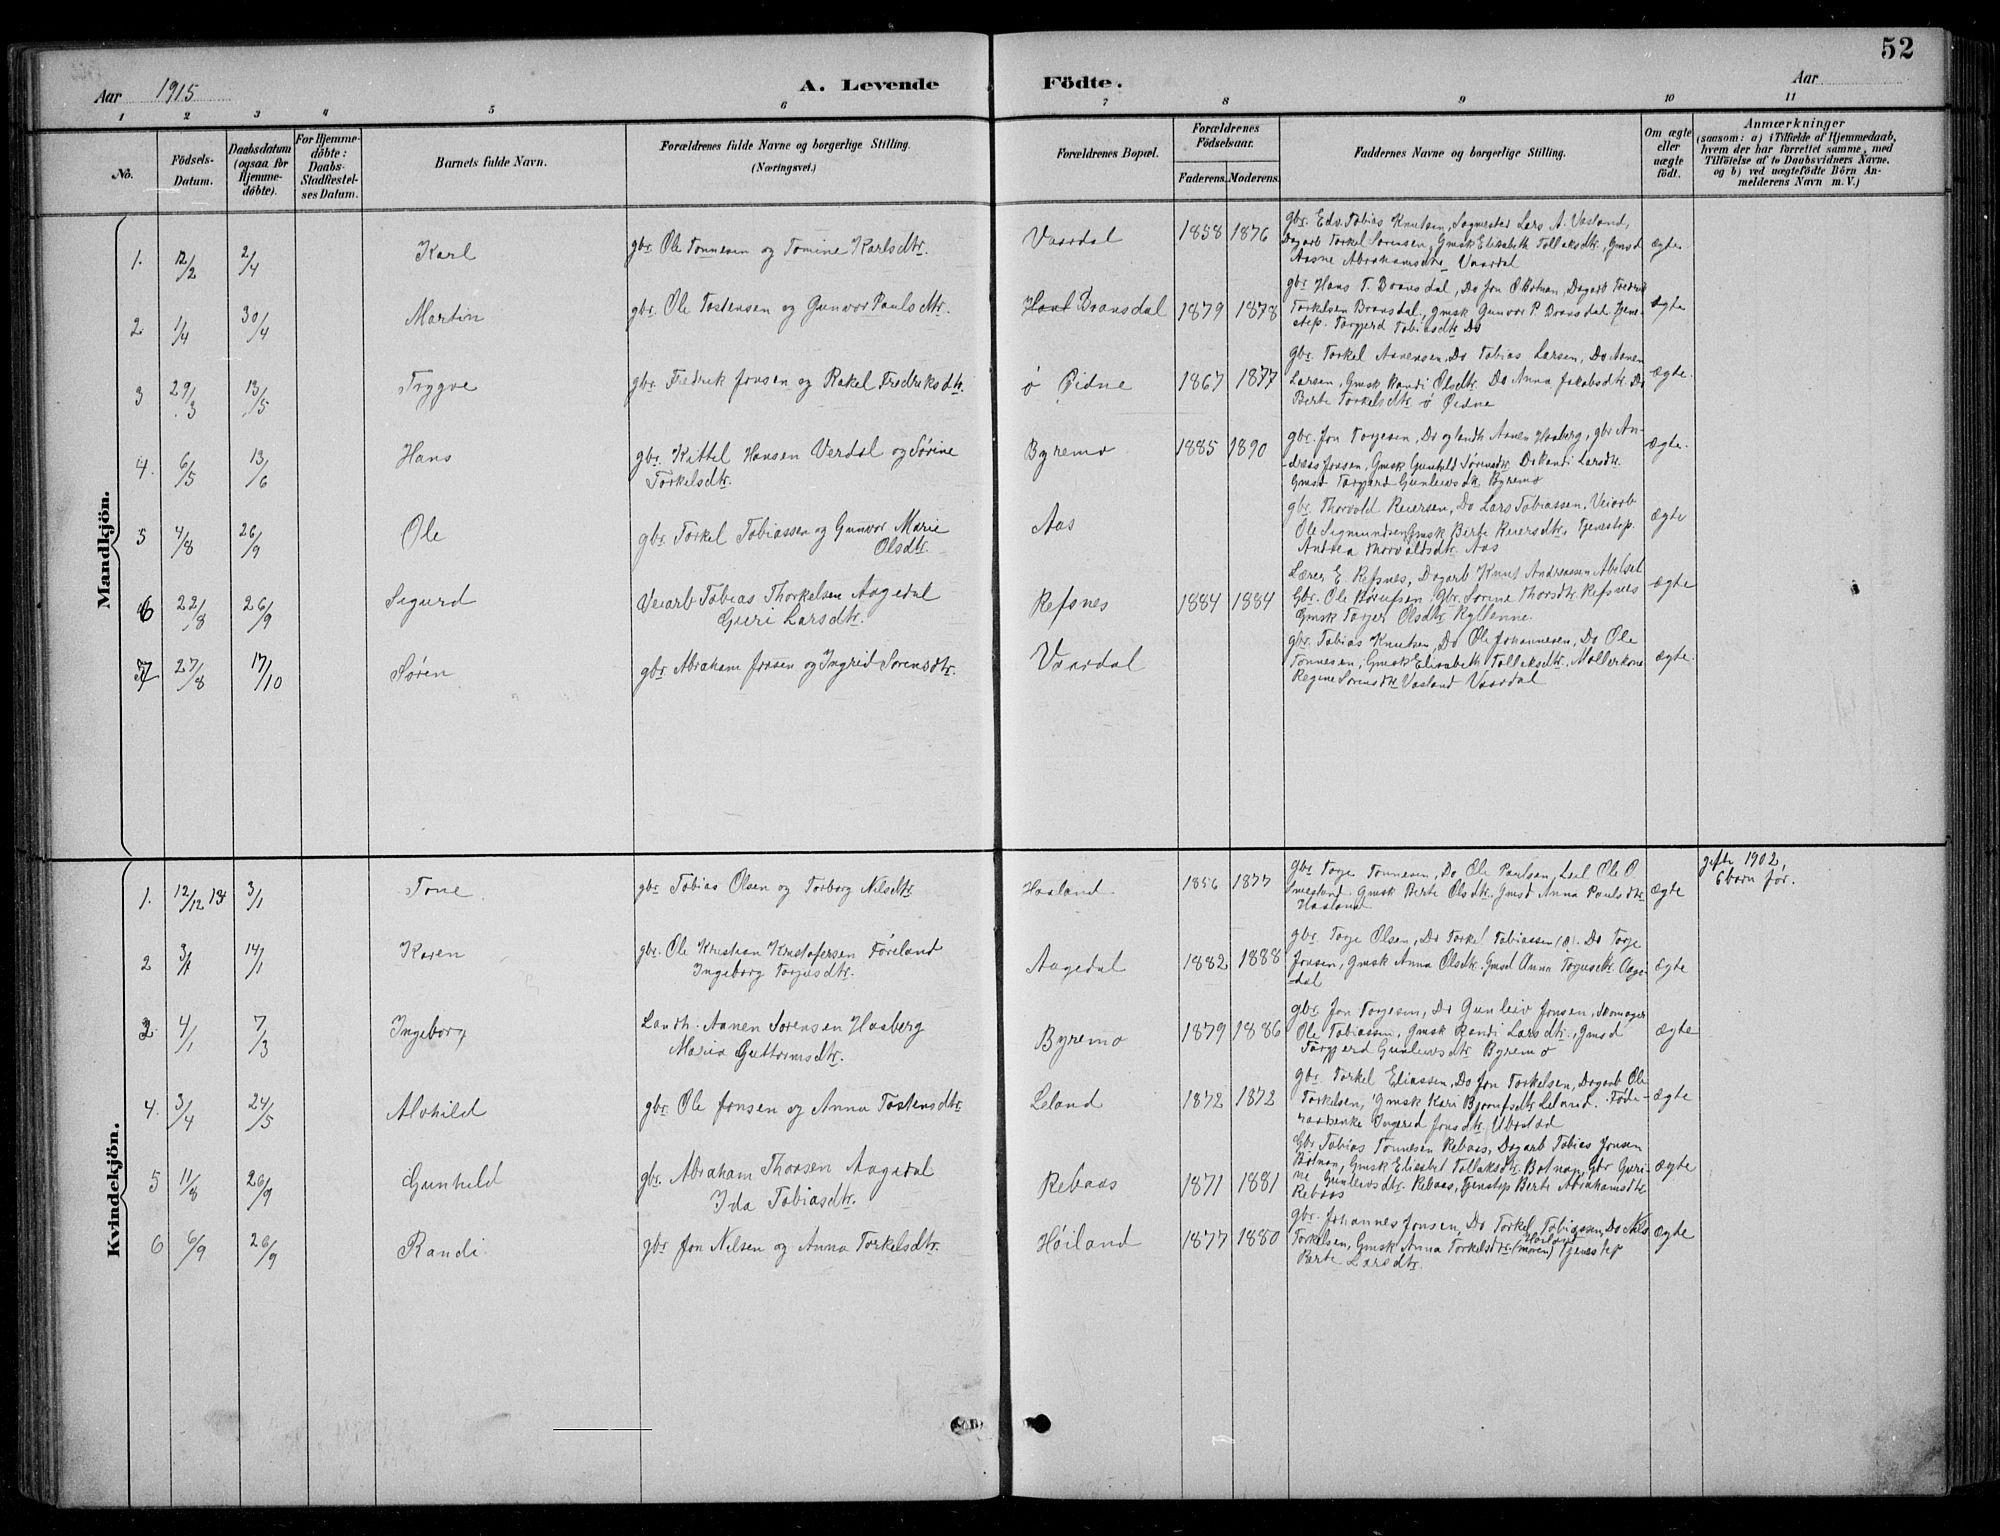 SAK, Bjelland sokneprestkontor, F/Fb/Fbc/L0003: Klokkerbok nr. B 3, 1887-1924, s. 52